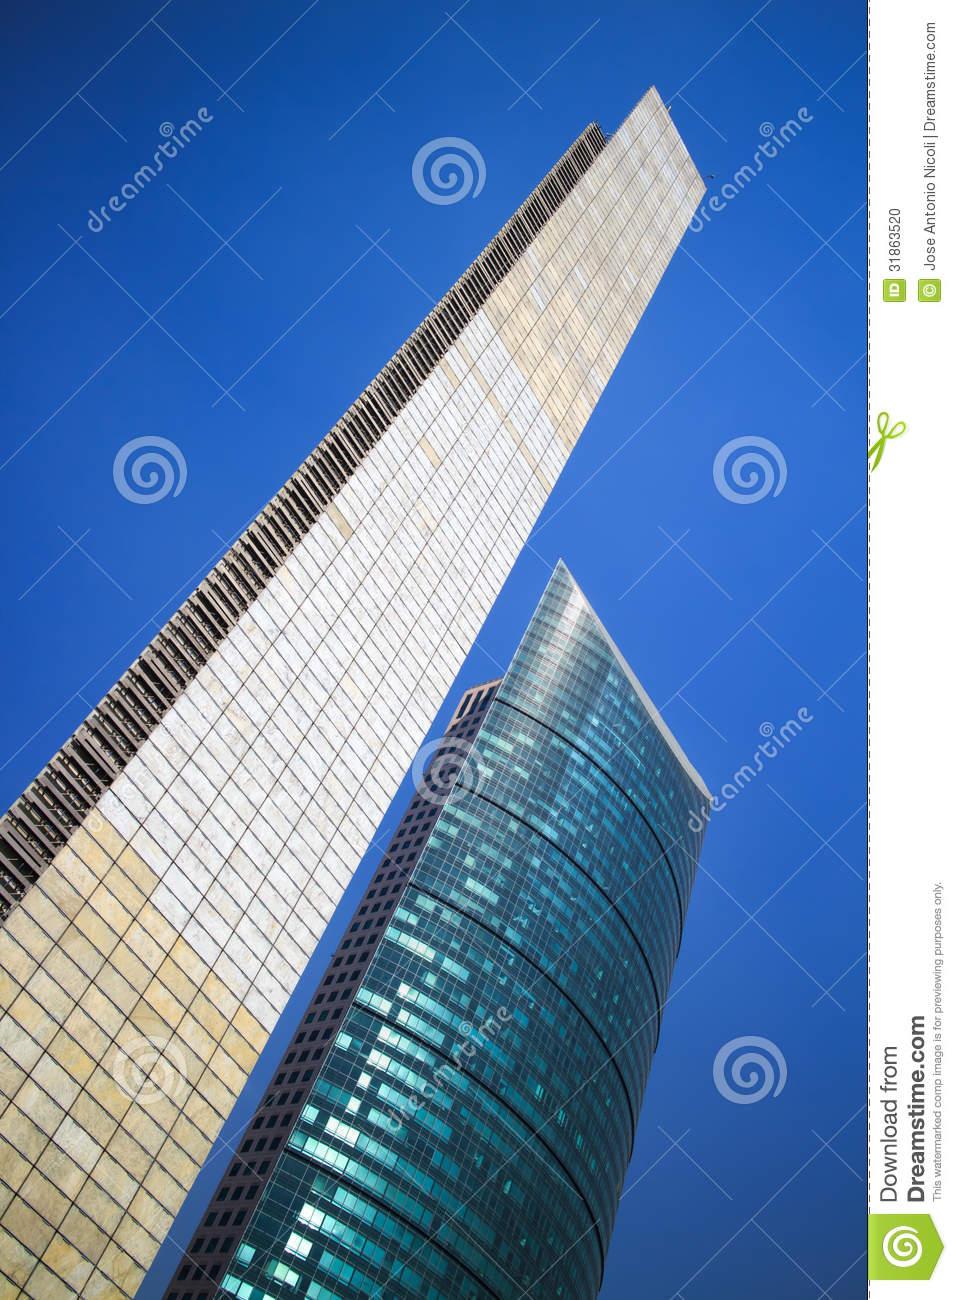 Pillar Of Light And Torre Mayor Skyscraper In Mexico City. Stock.